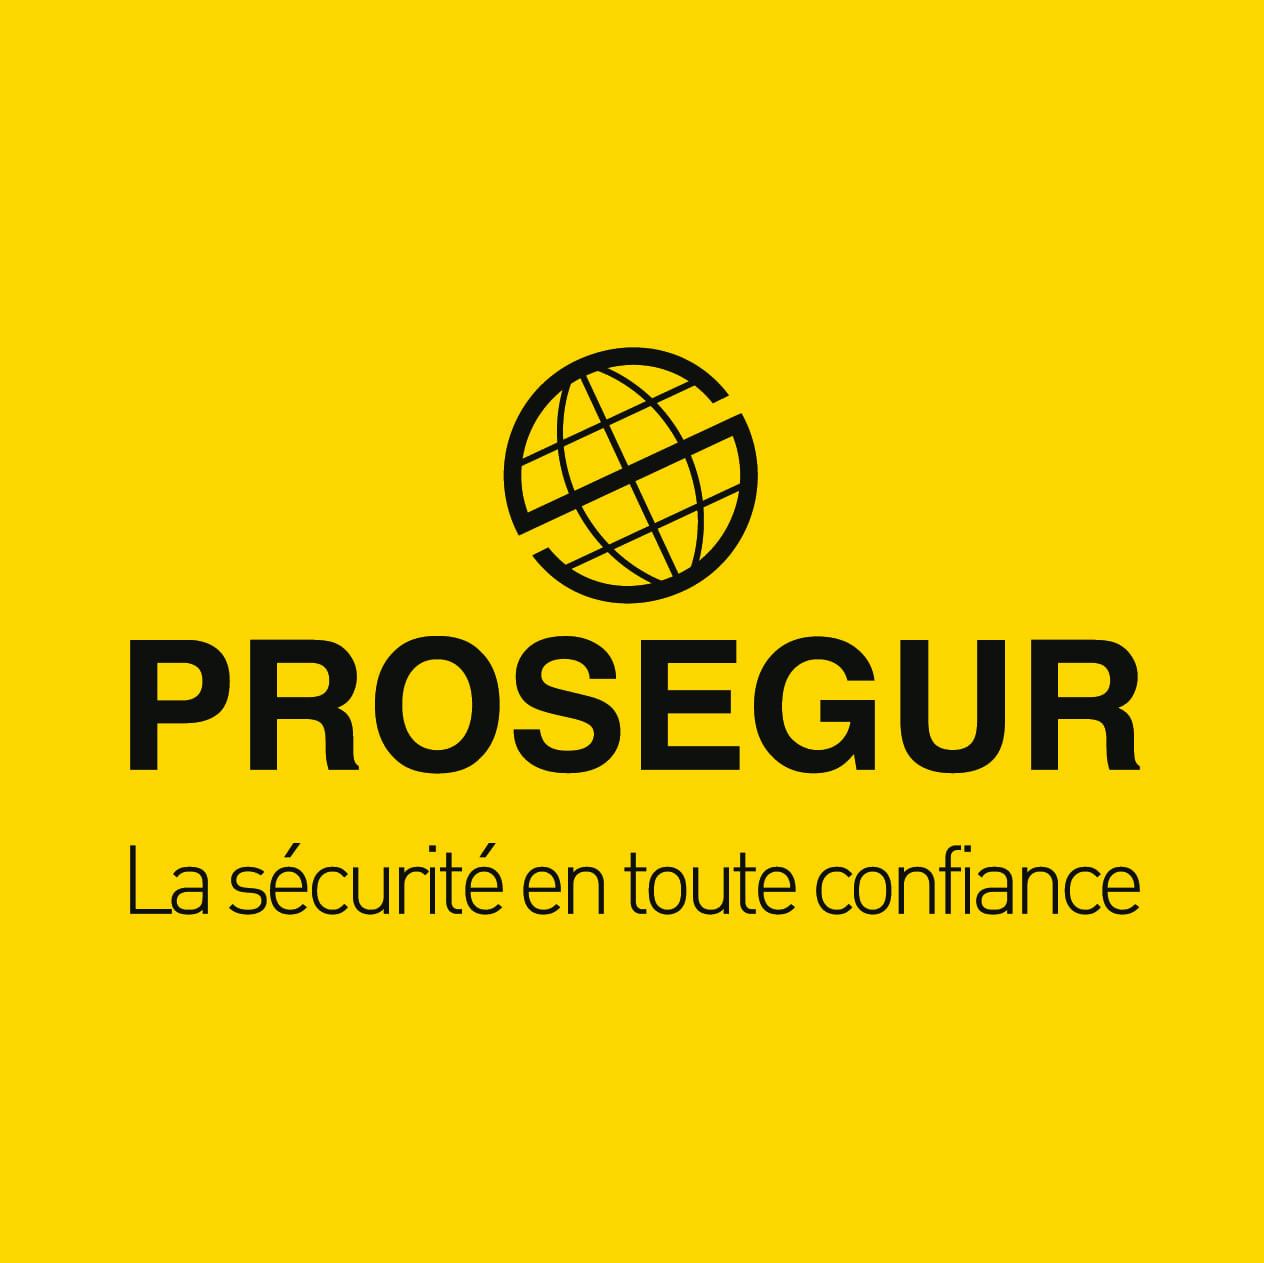 LOGO-CUADRADO+claim-francés-HIGH.jpg